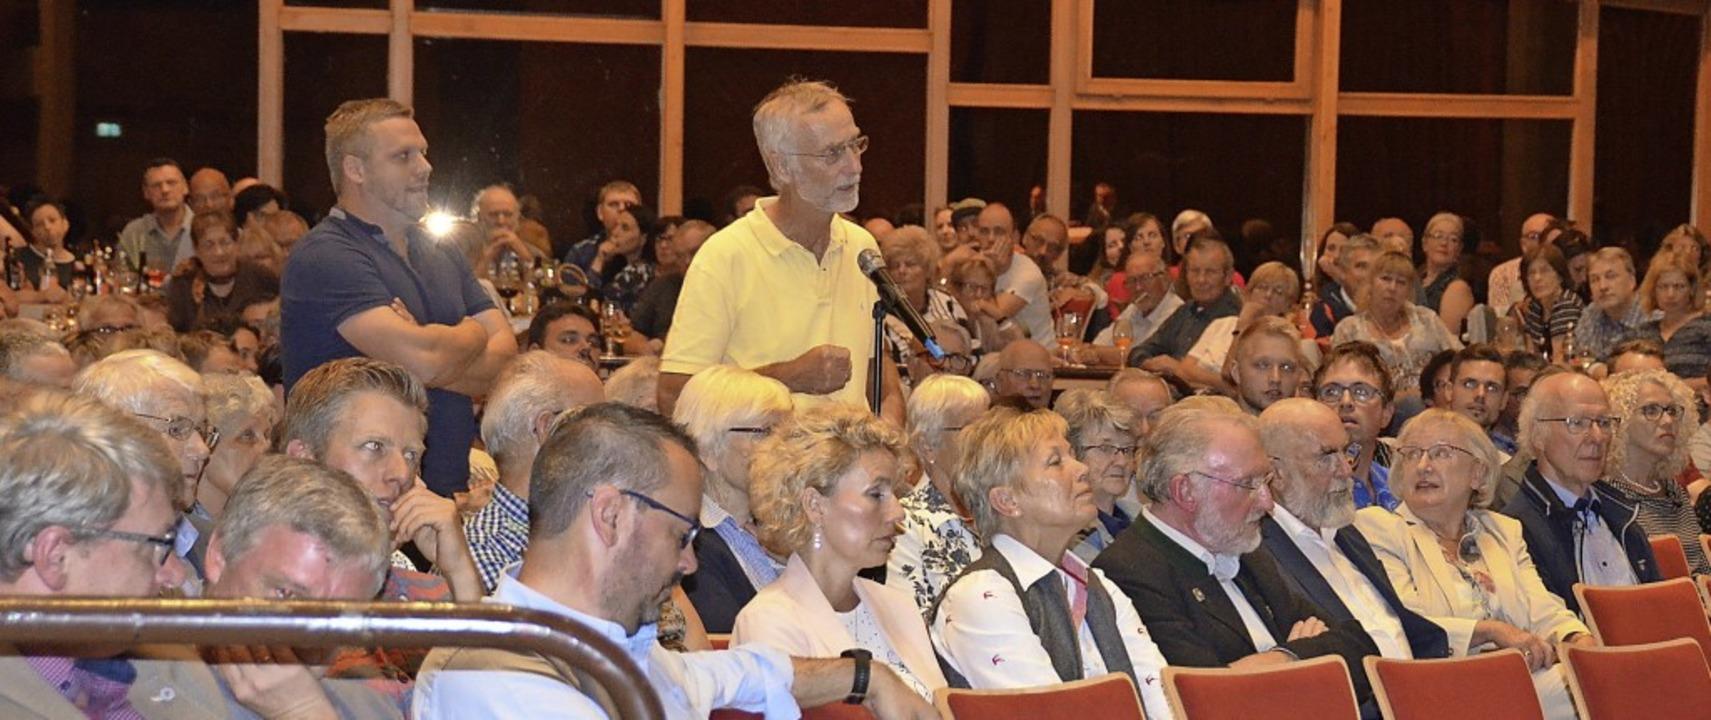 Mehrere Bürger stellten den beiden anwesenden Kandidaten Fragen.     Foto: Sebastian Barthmes